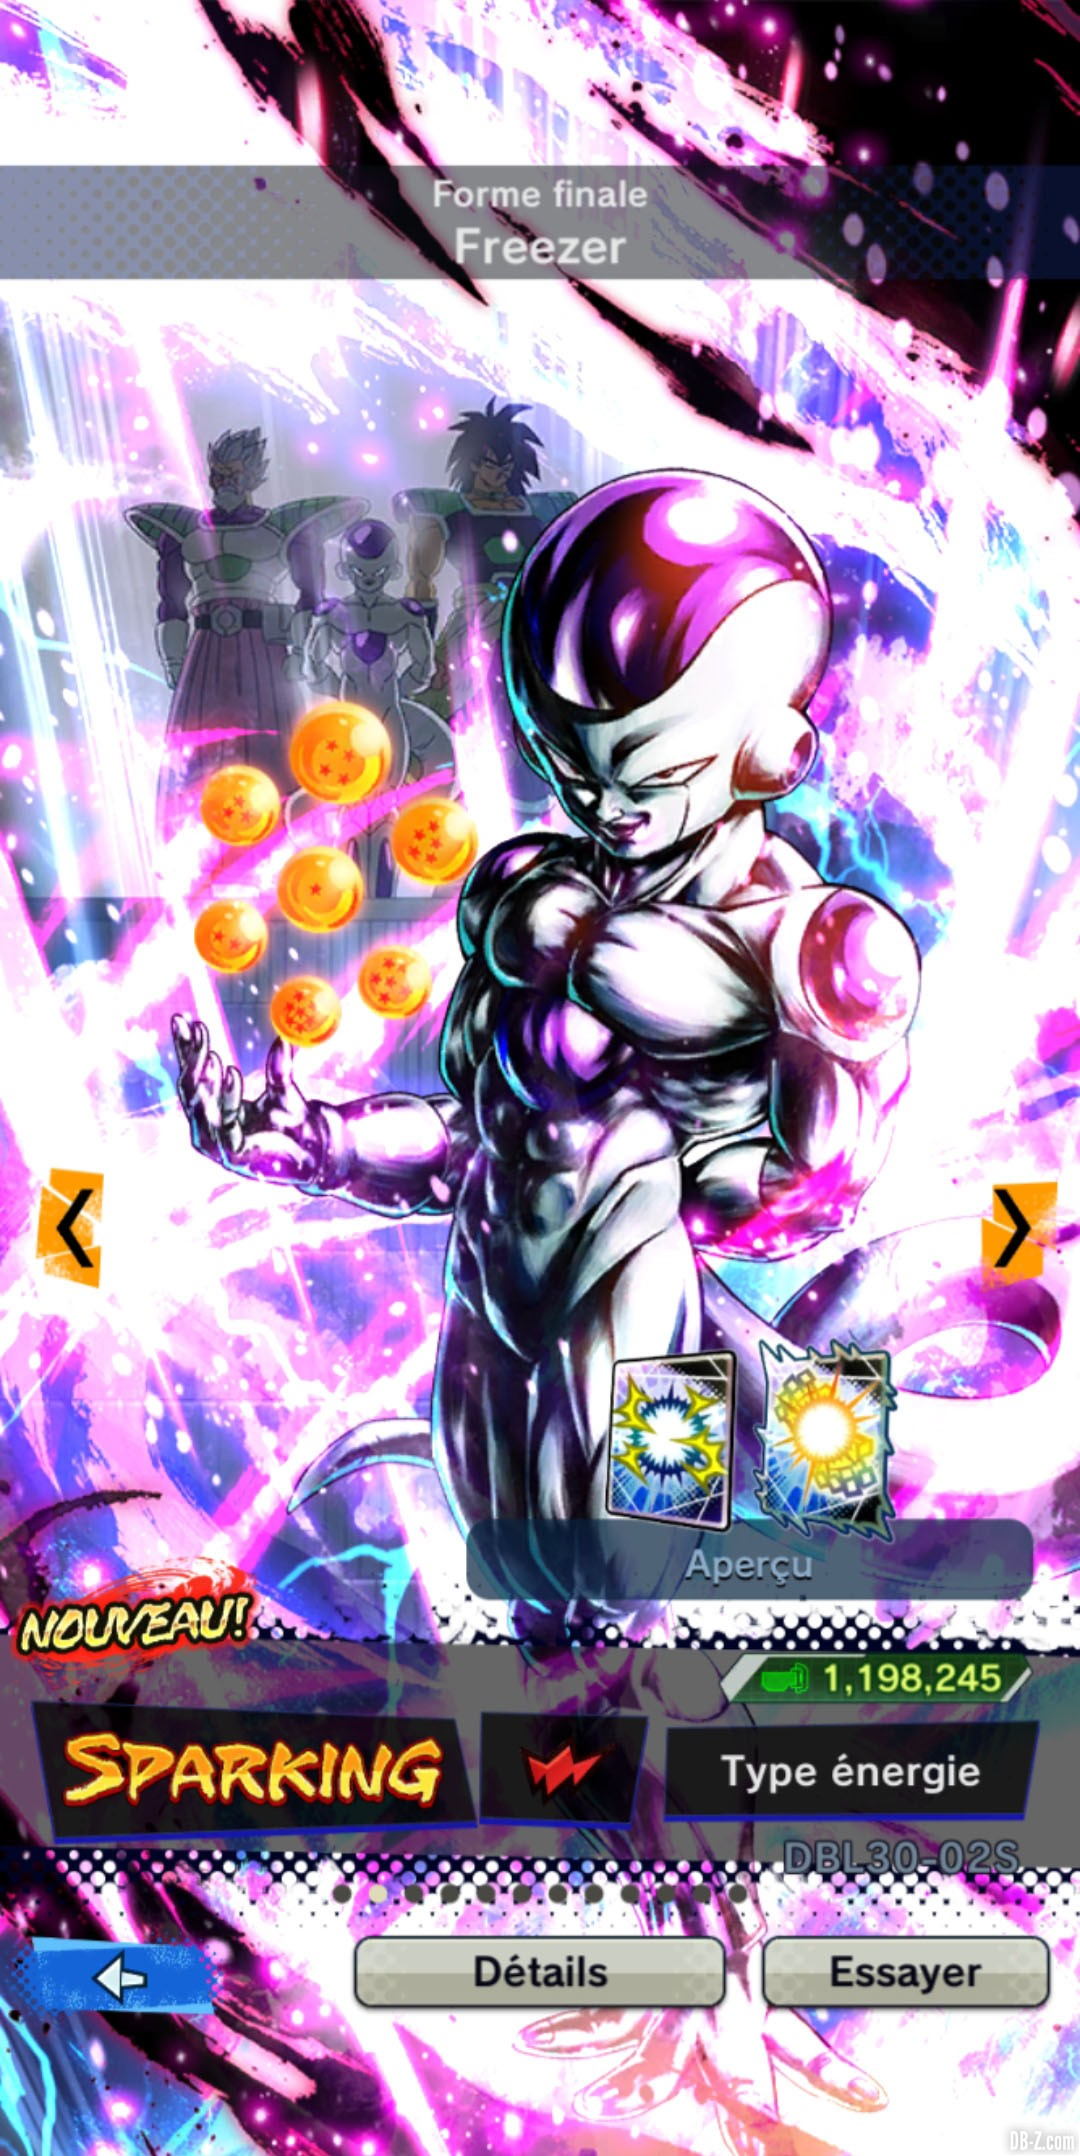 Dragon Ball Legends Freezer ROUGE Energie